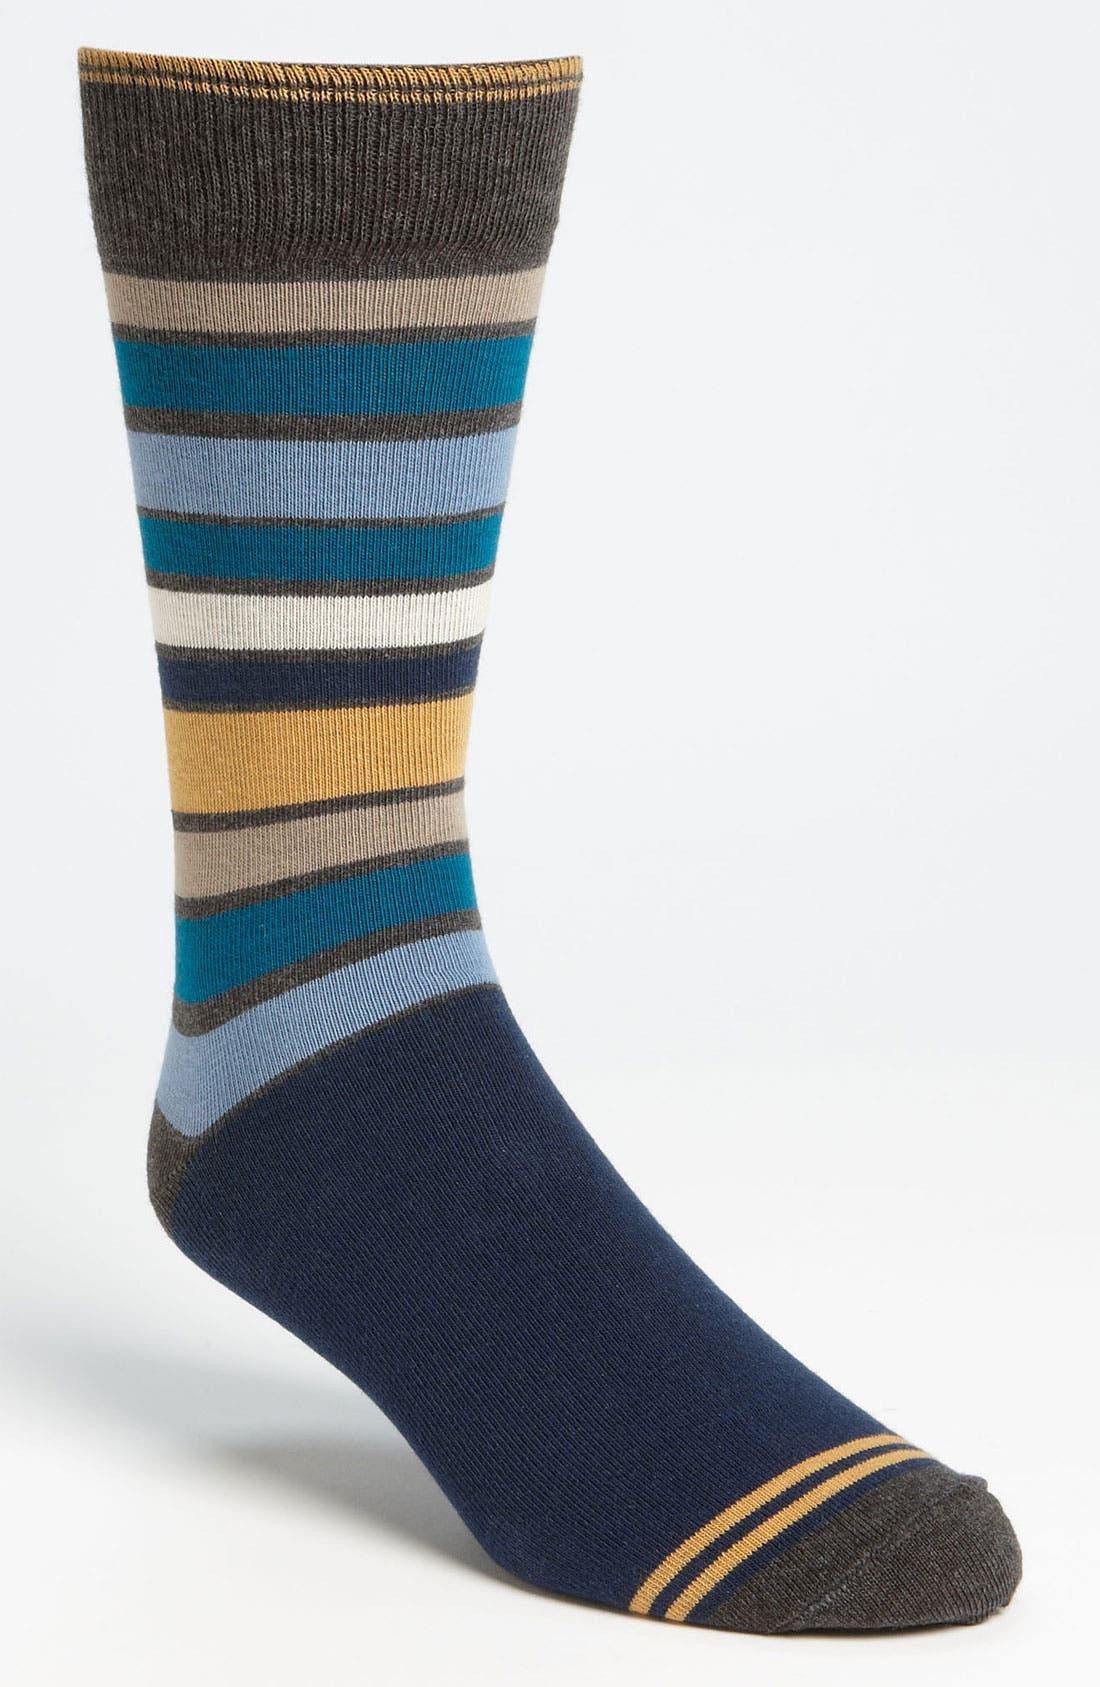 Alternate Image 1 Selected - Pact 'Blues' Socks